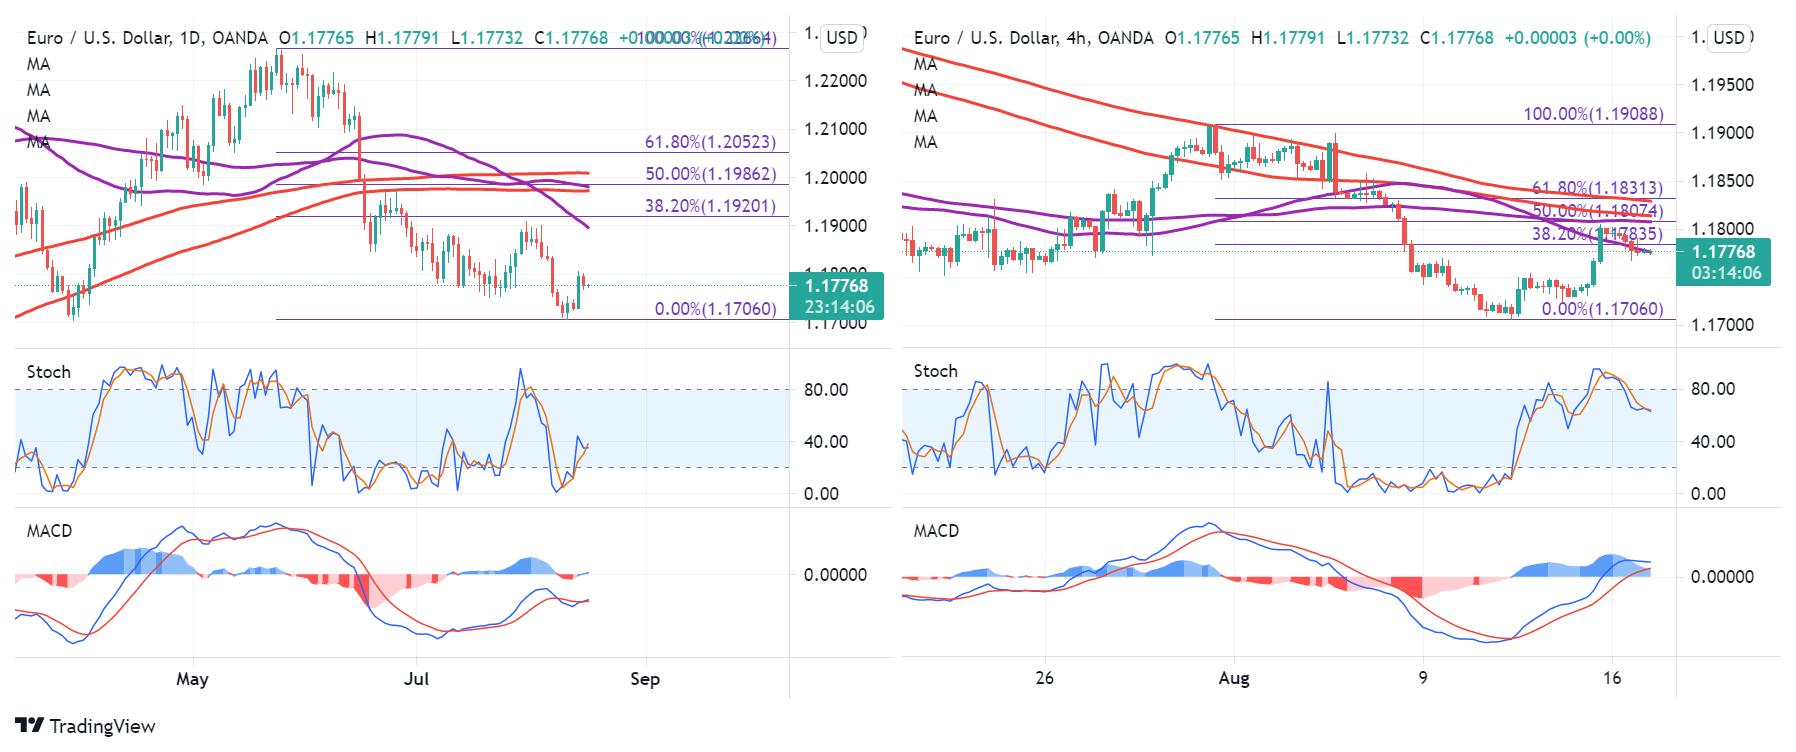 EUR/USD: Correction Underway? | Investing.com